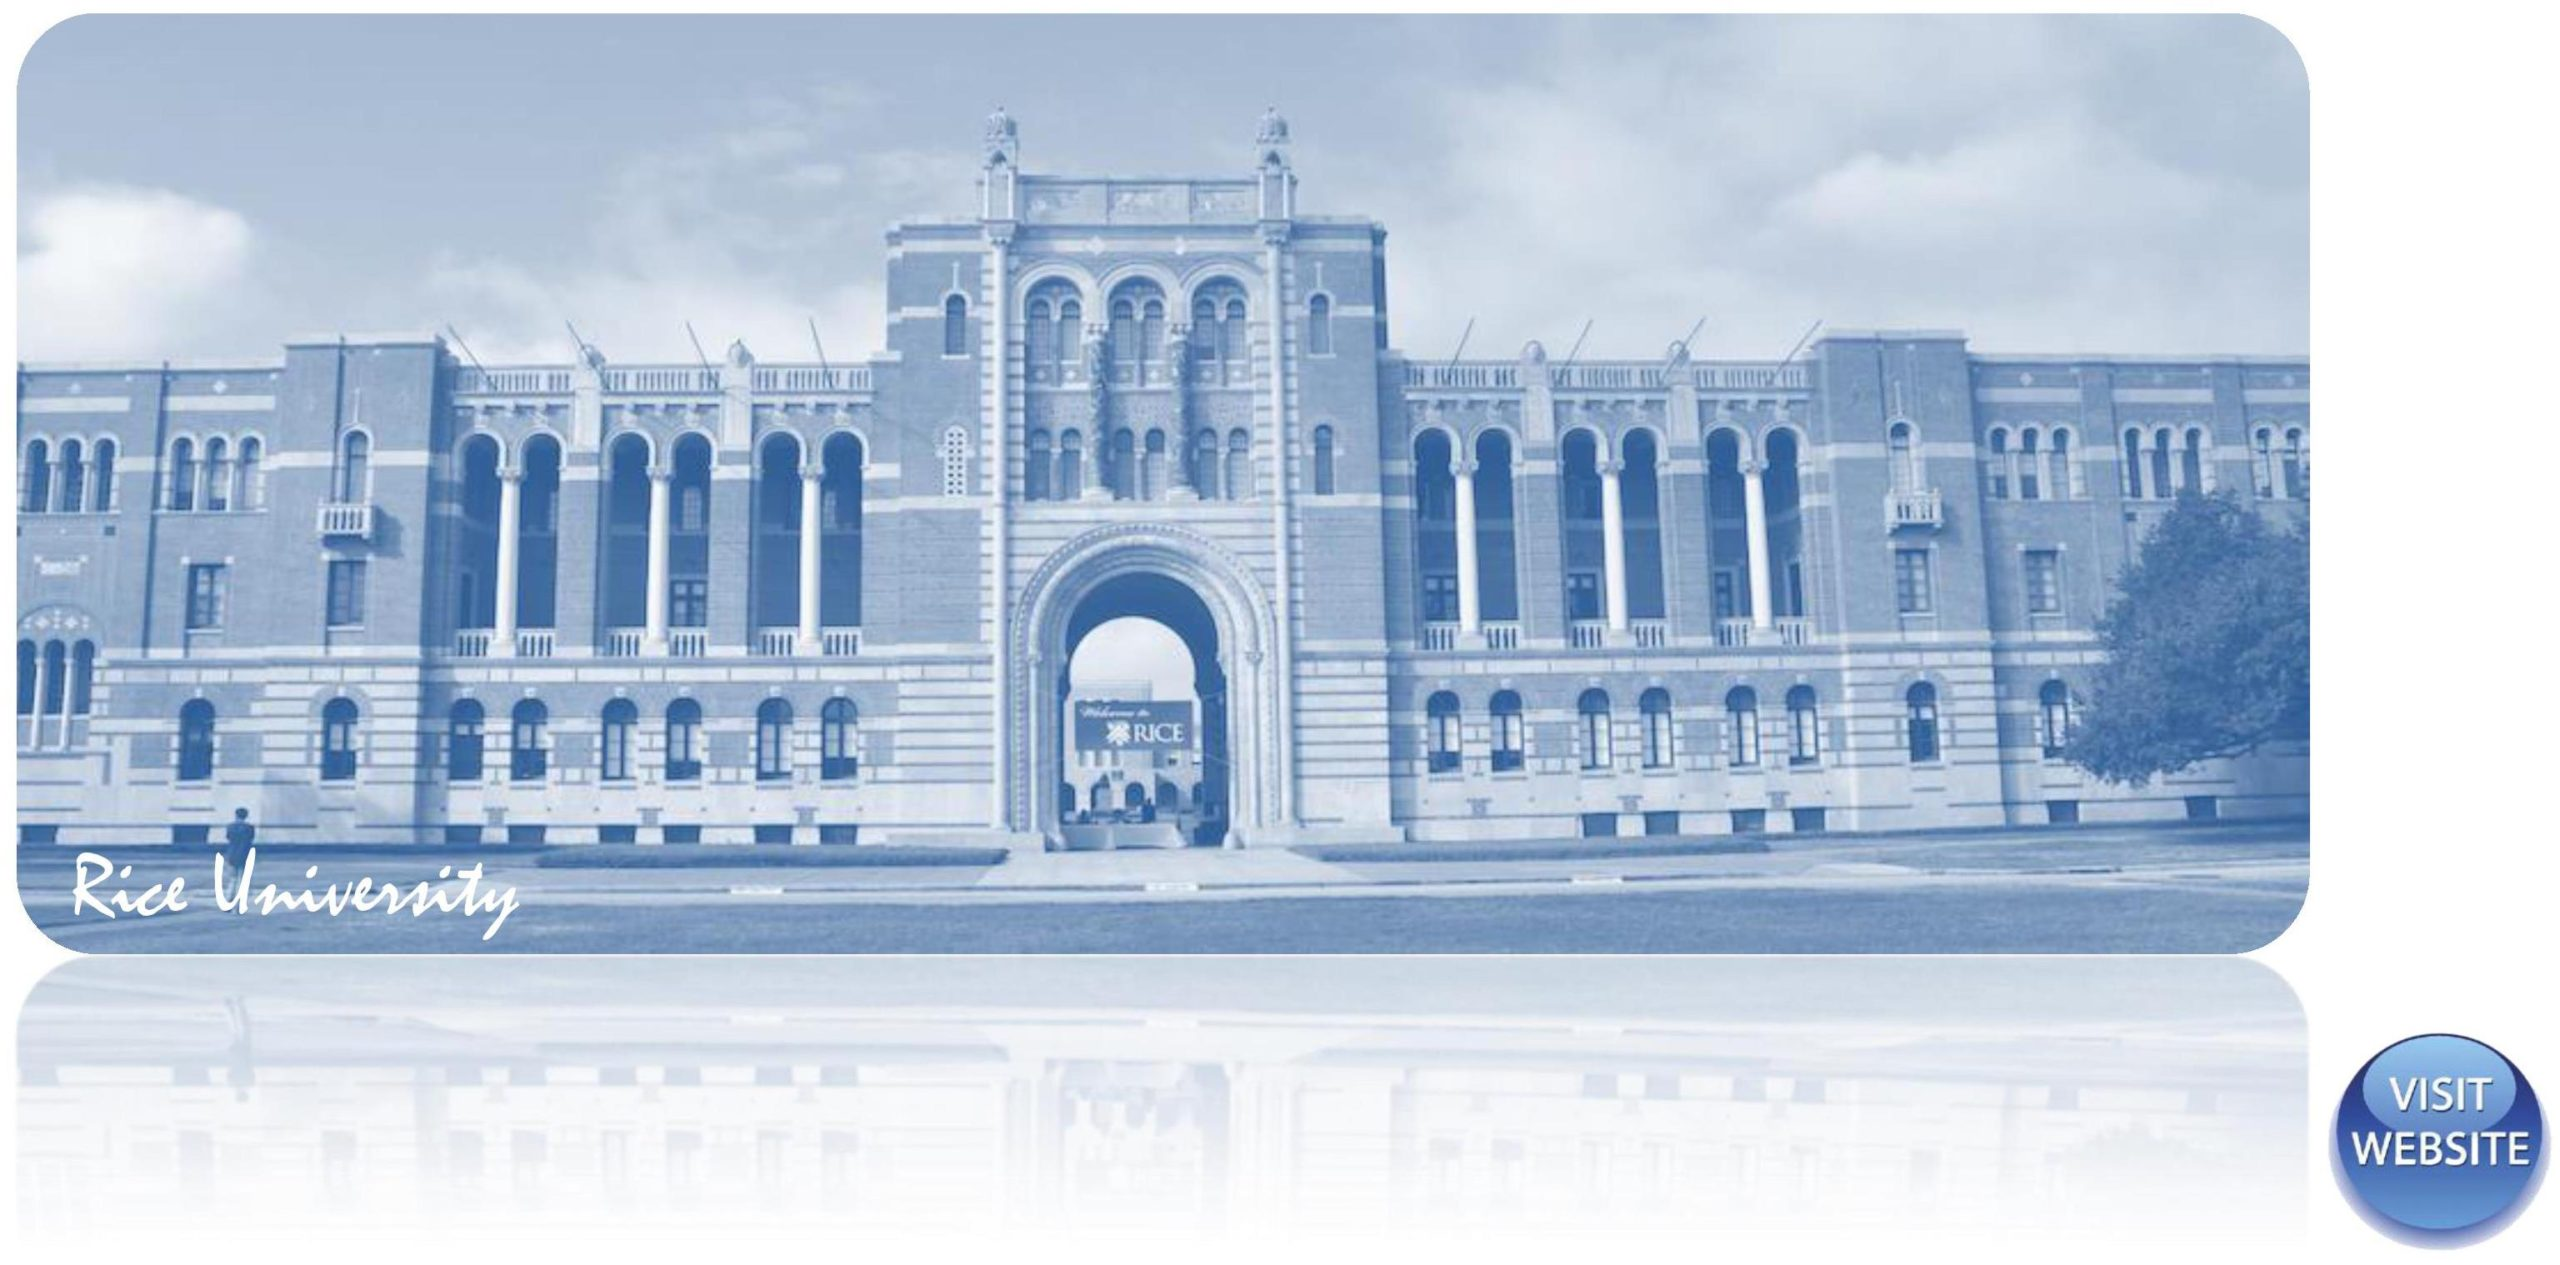 Rice University USA